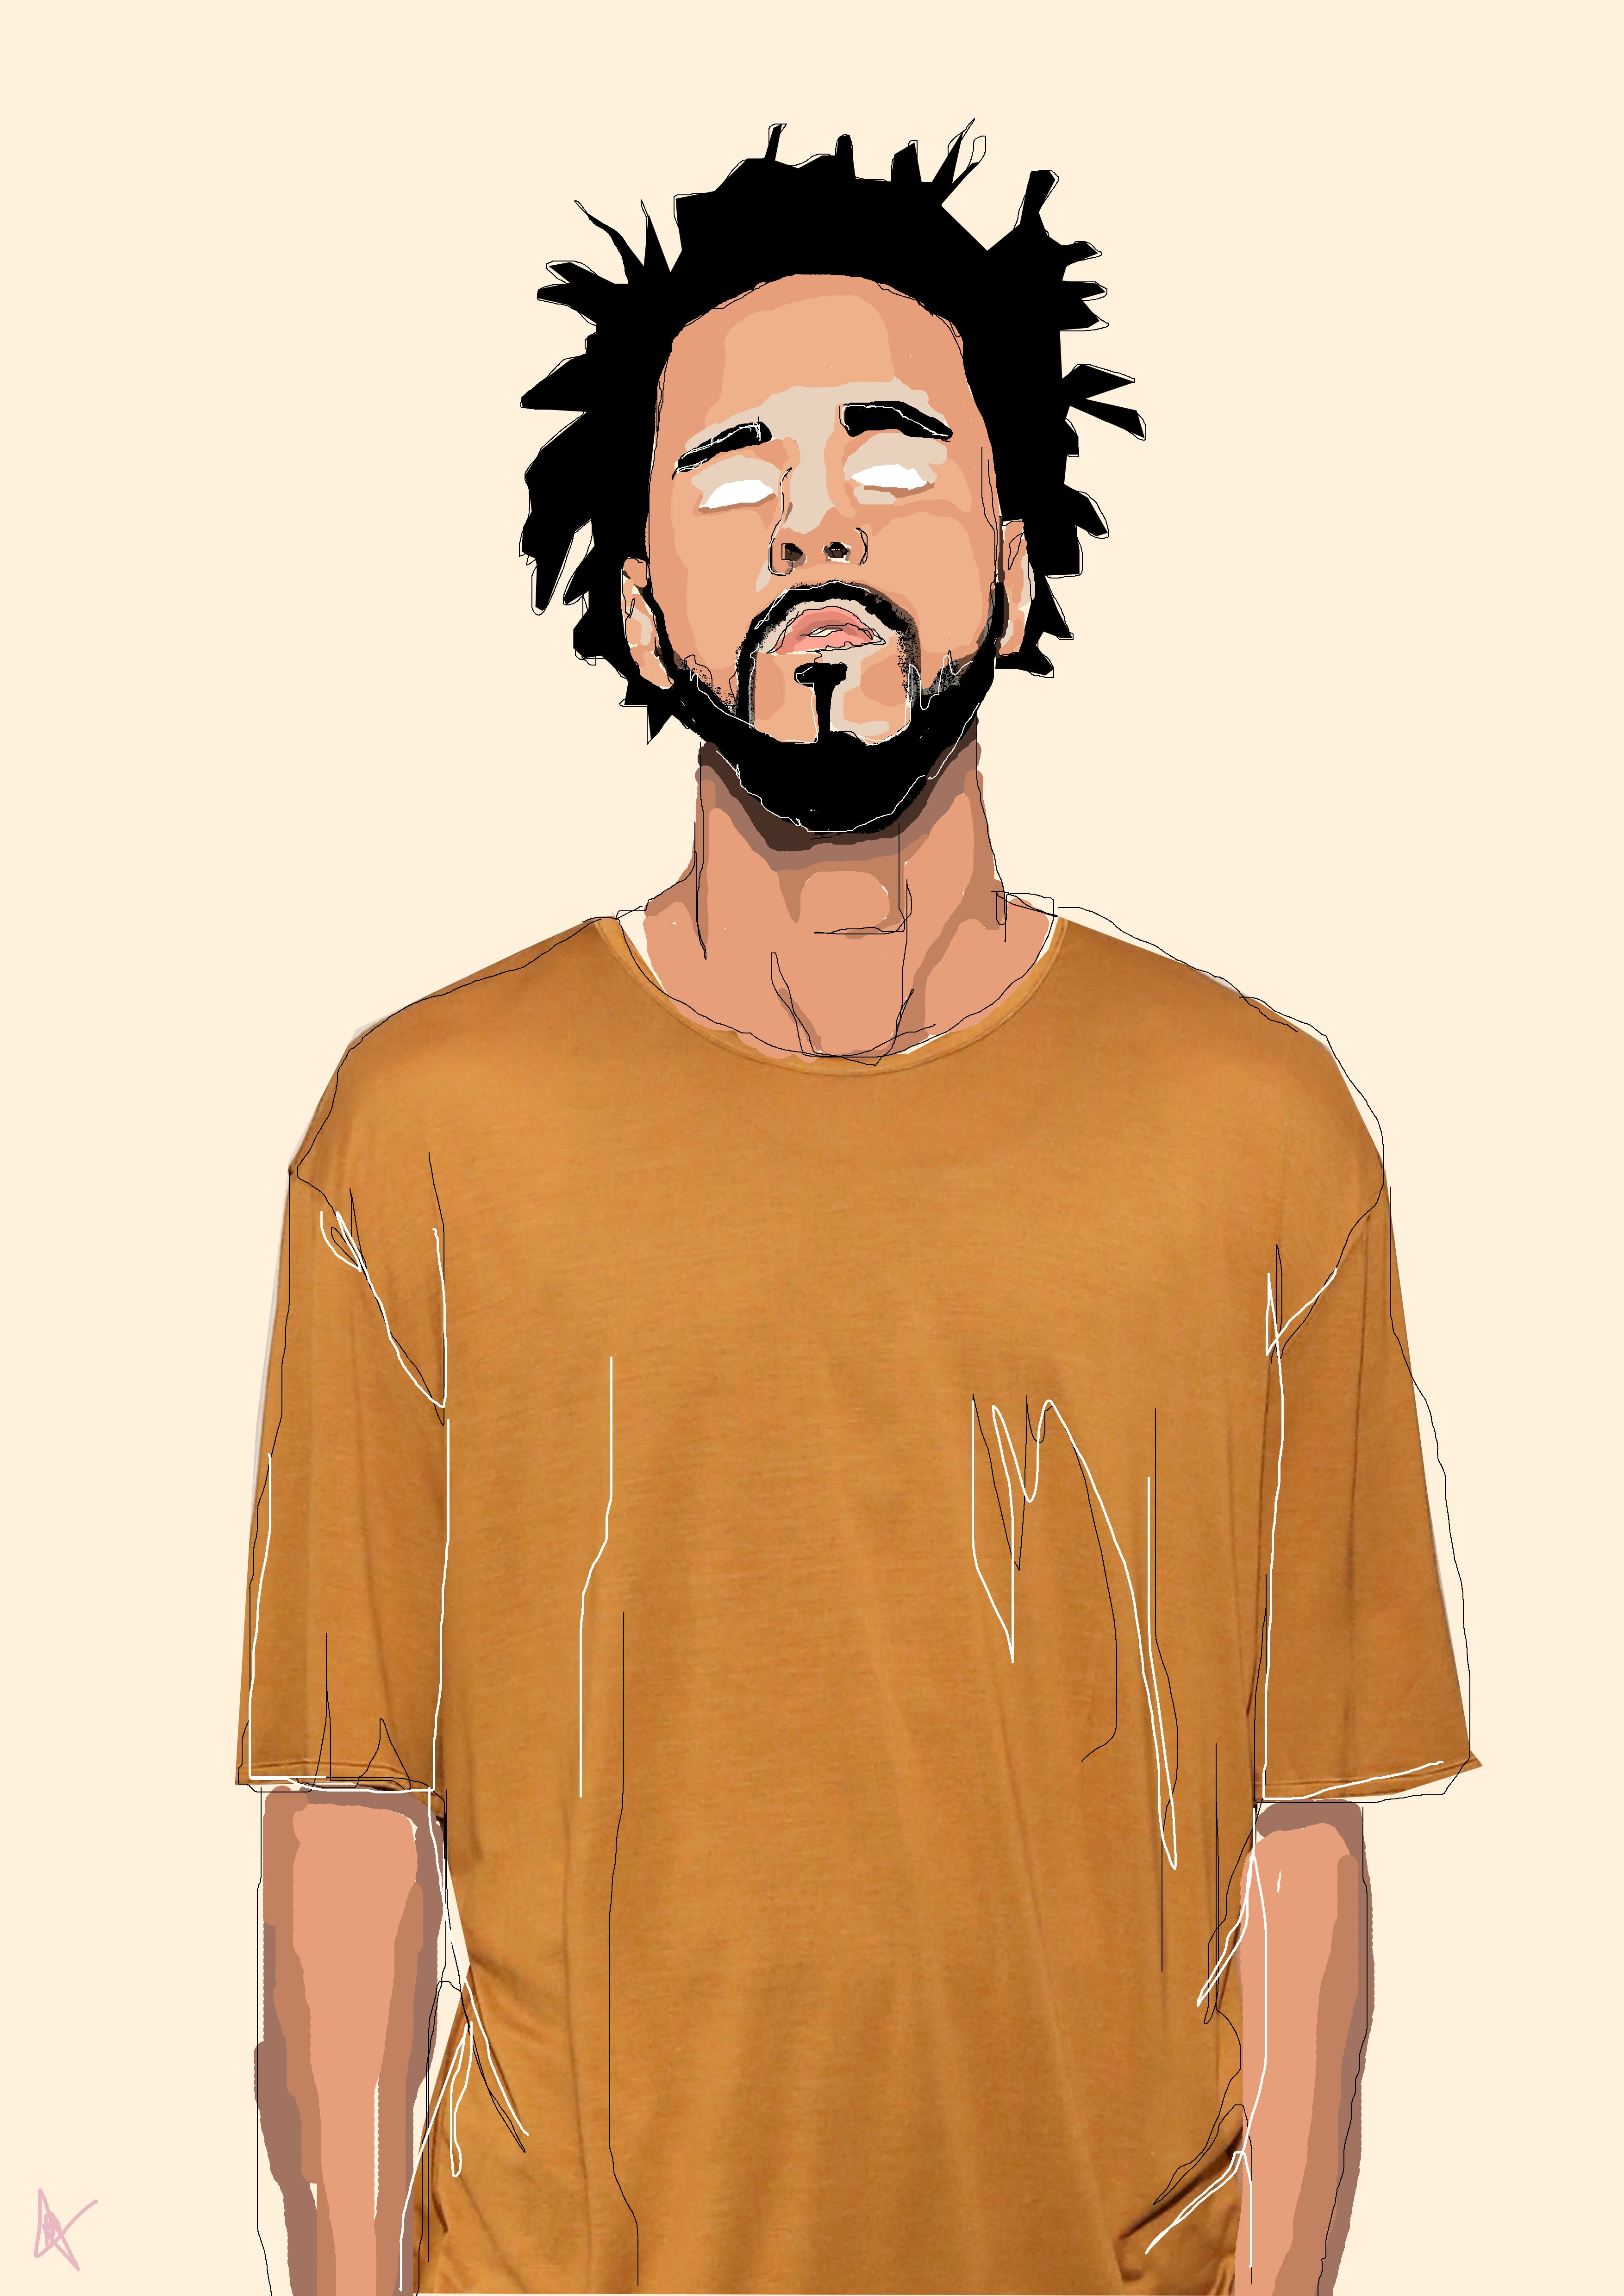 Kendrick lamar wallpaper iphone 6 - J Cole Wallpaper